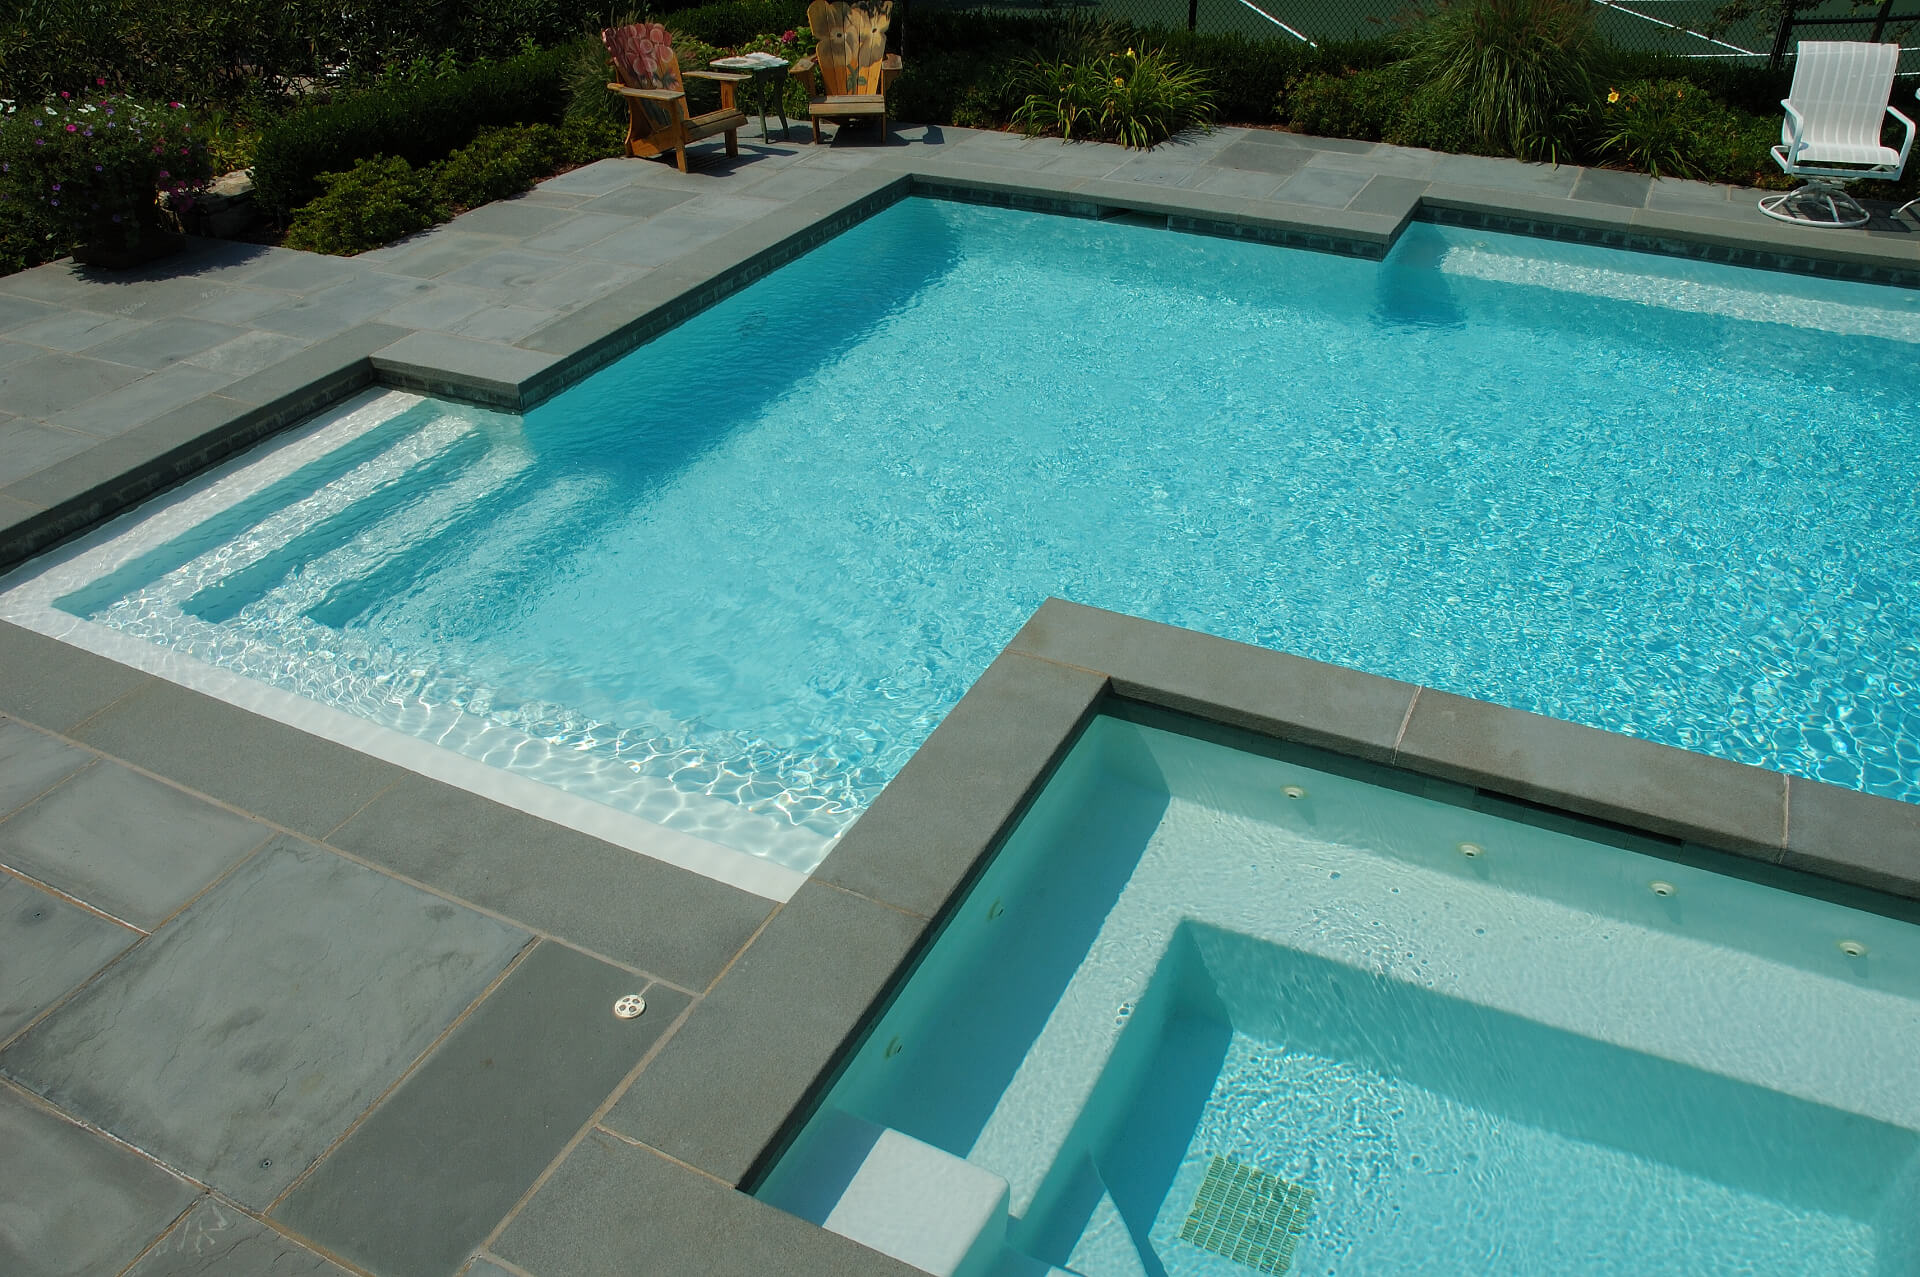 Shotcrete, Vinyl, Fiberglass Pool Materials